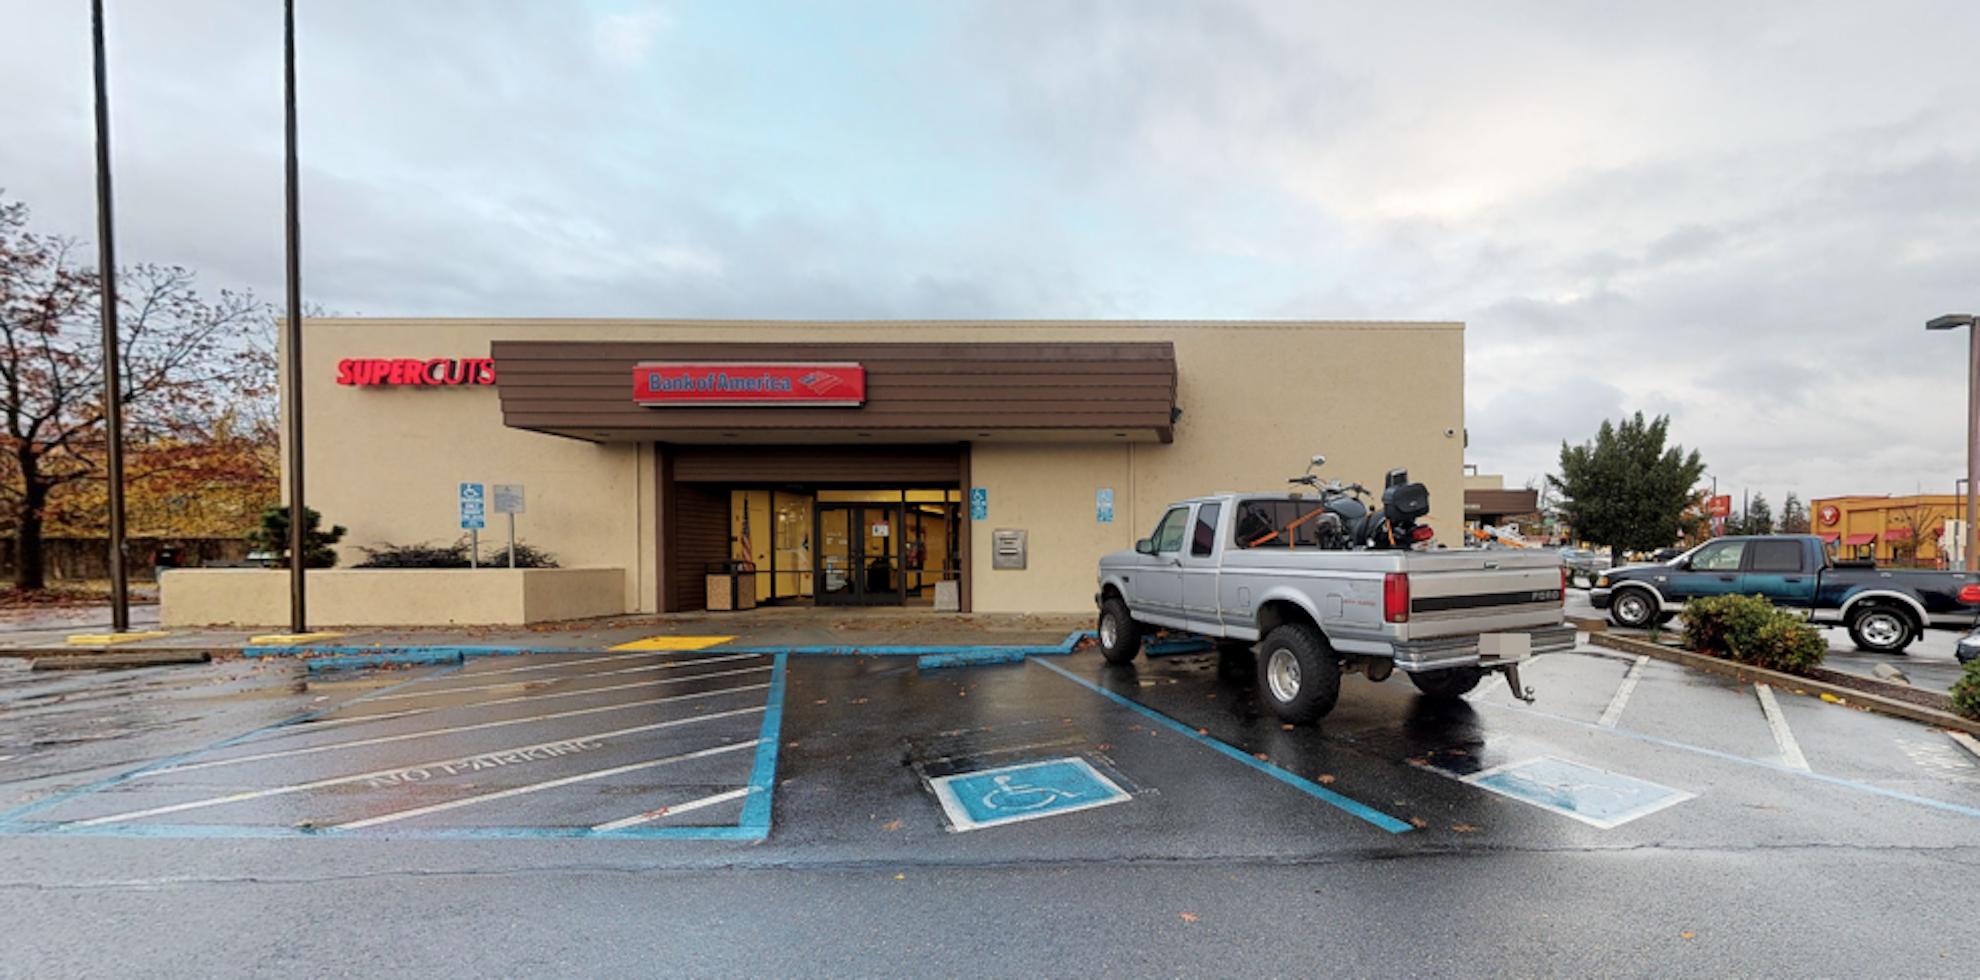 Bank of America financial center with walk-up ATM   1820 Oro Dam Blvd E, Oroville, CA 95966